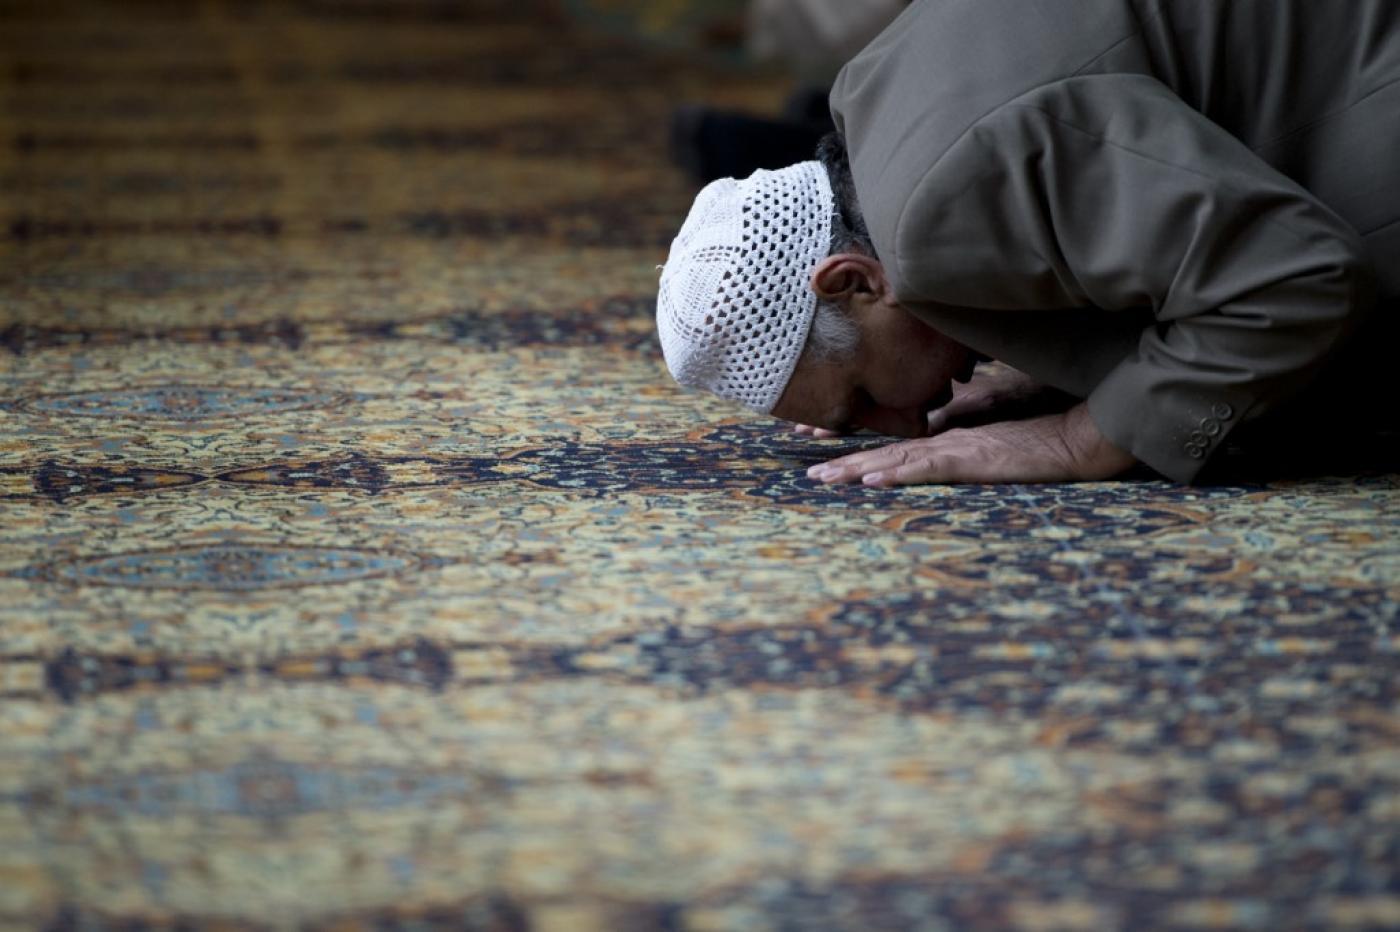 Coronavirus: BBC Begins Broadcasting Weekly Islamic Sermons as Mosques Remain Shut